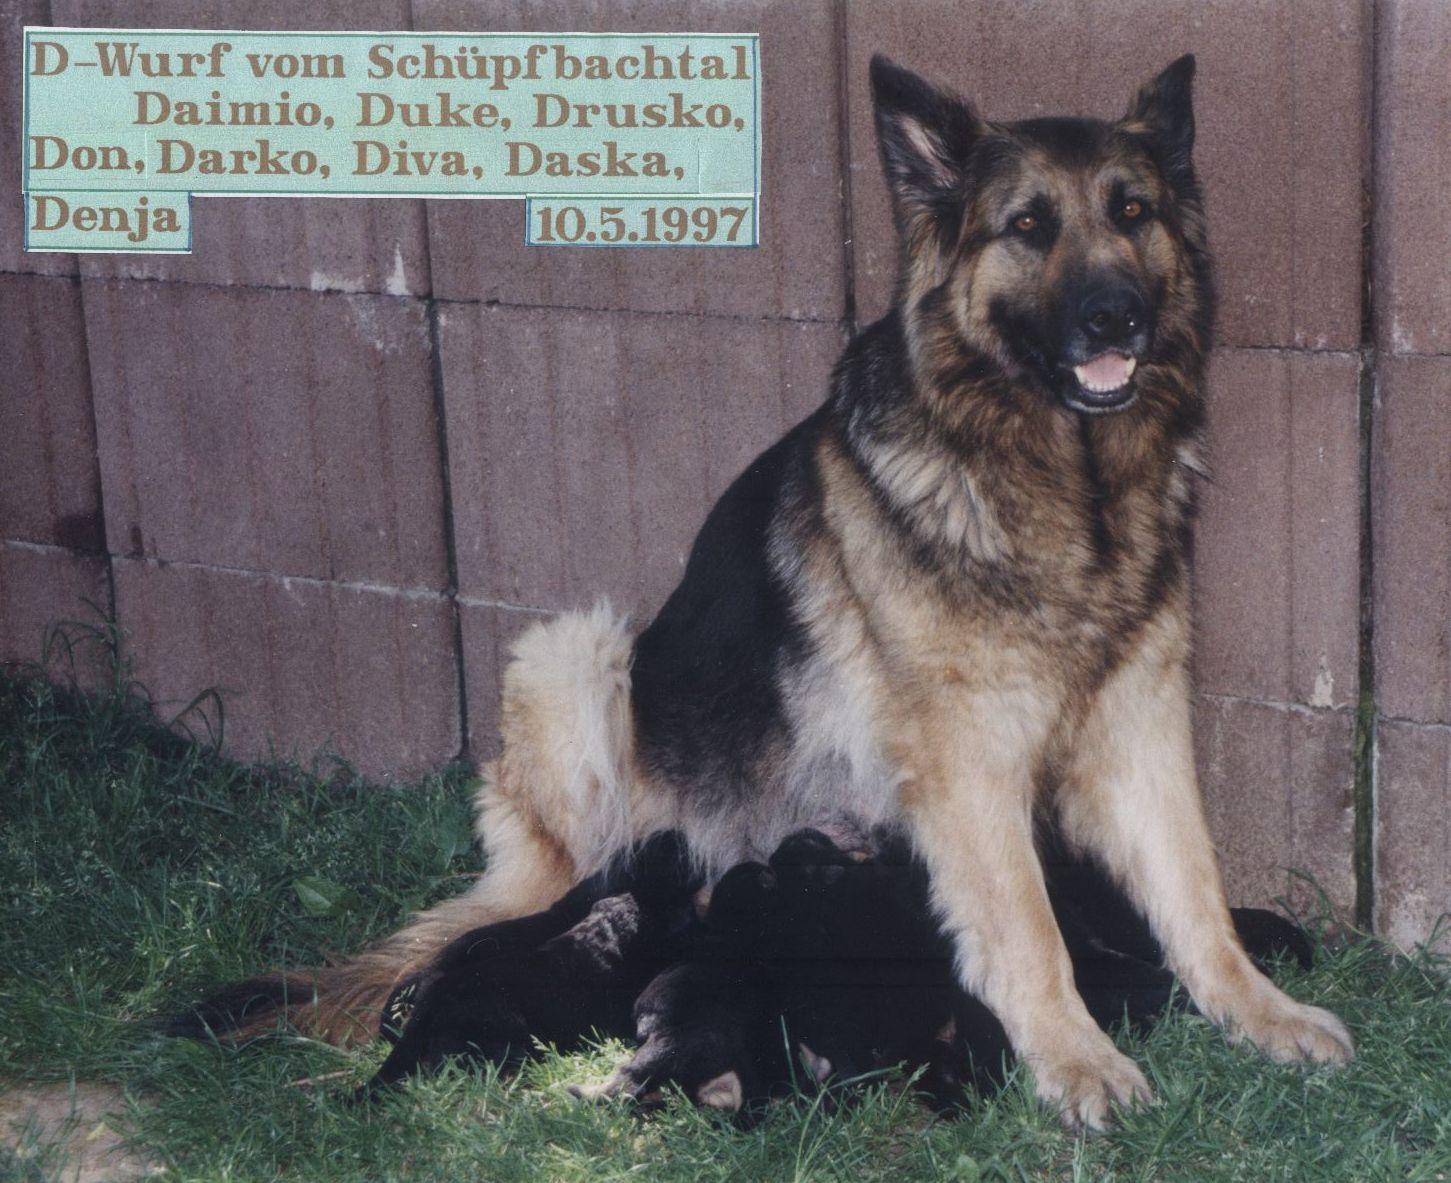 D-Wurf Schüpfbachtal